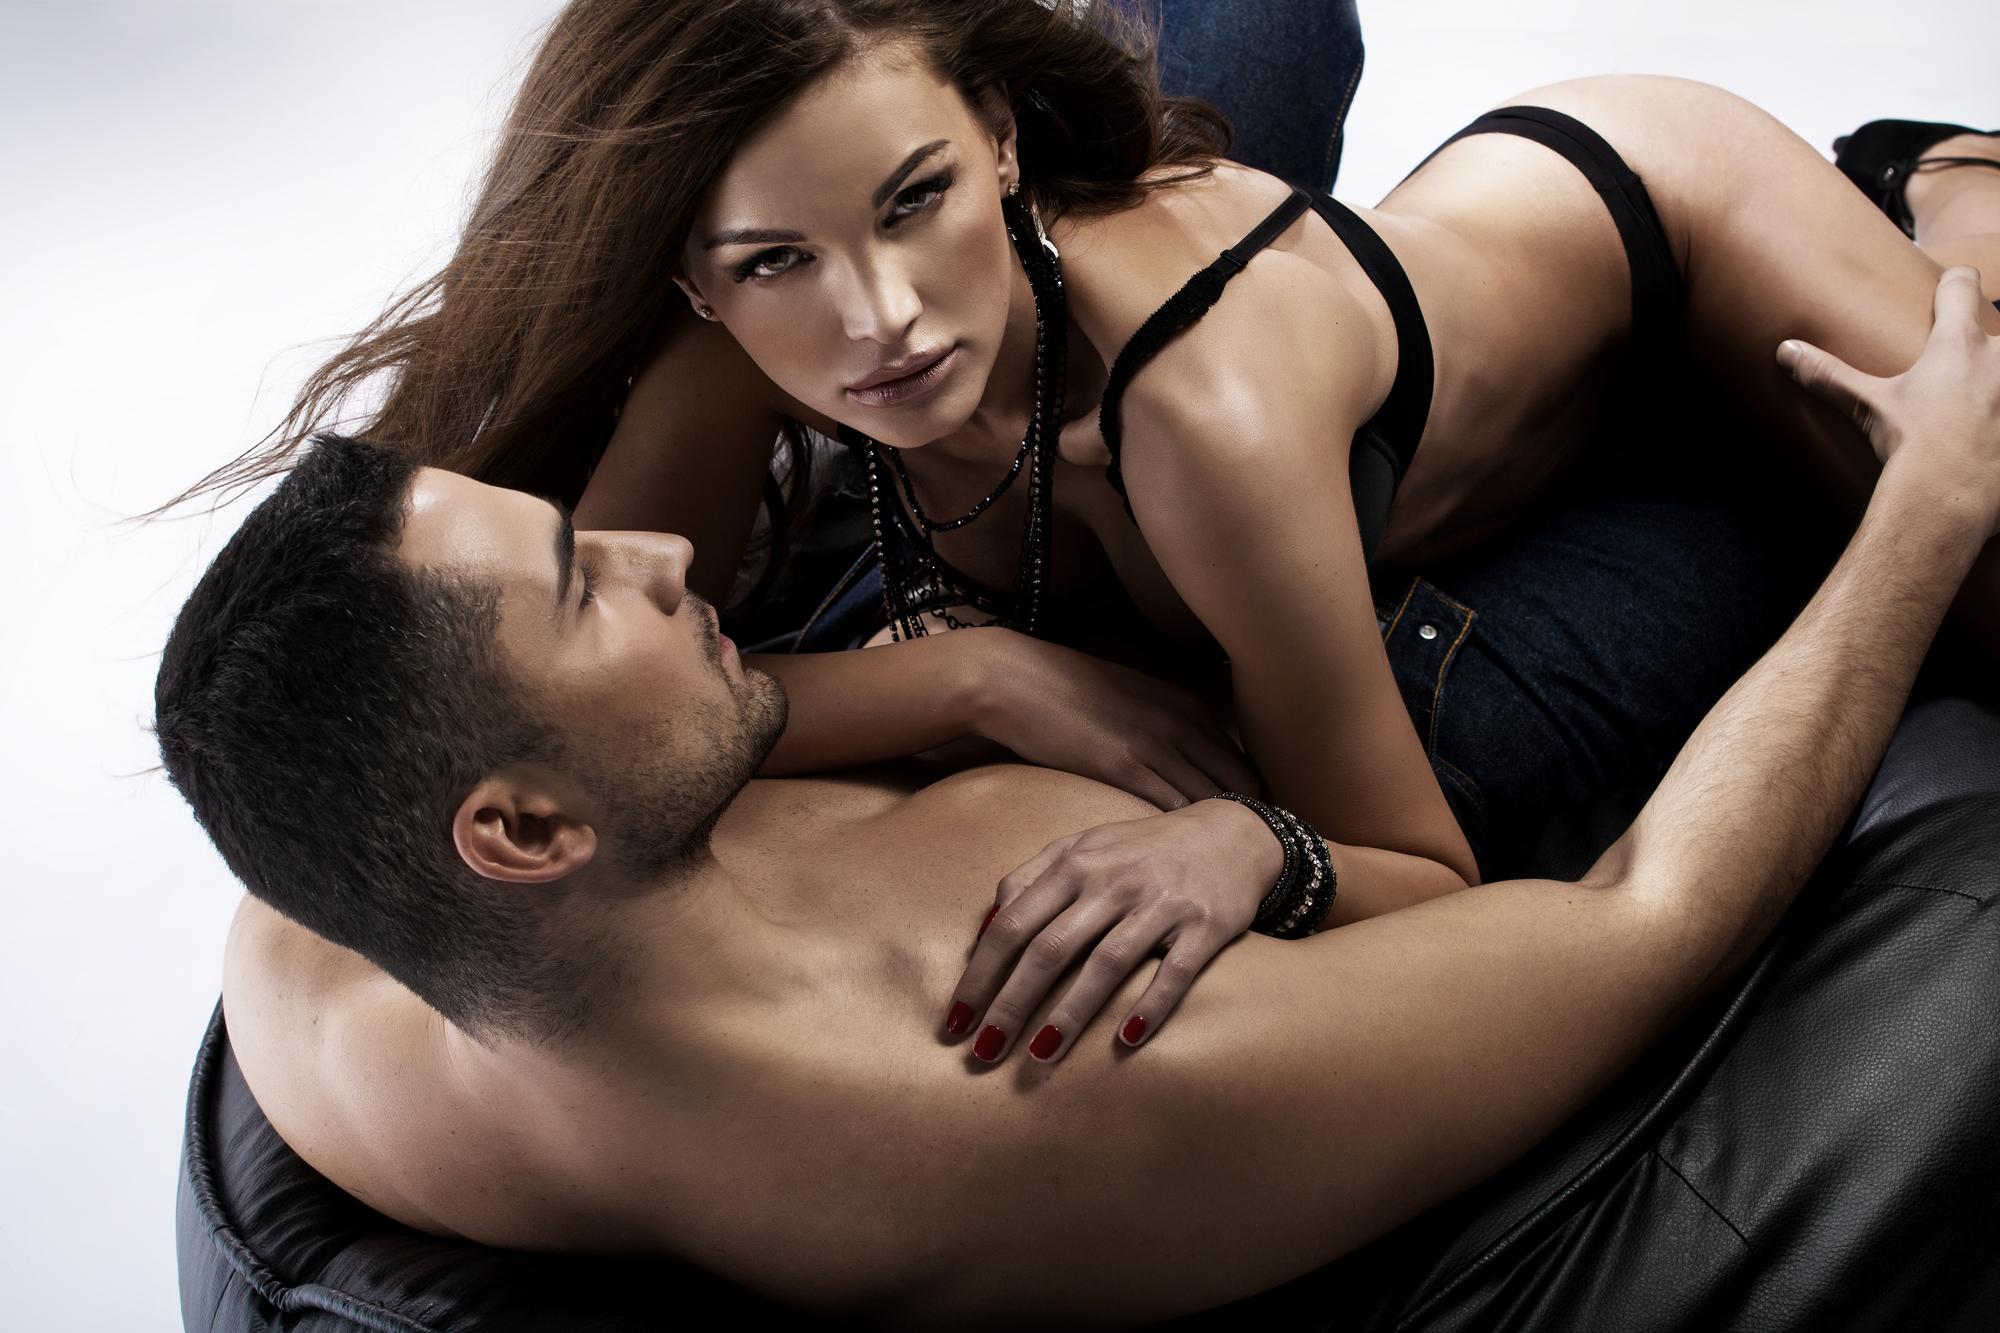 массаж интимных мест челны